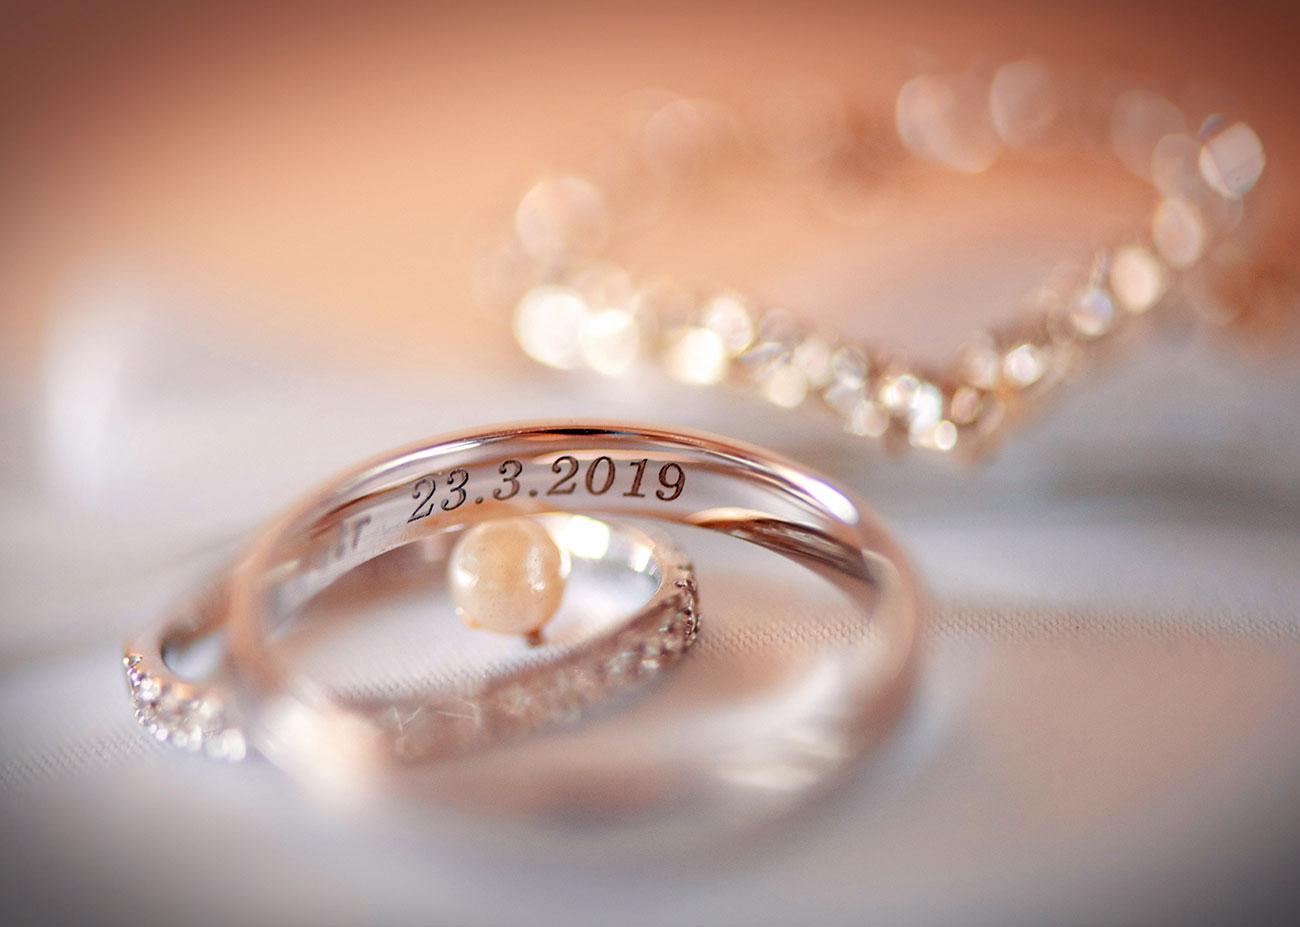 15 svatebni prstynek detail jihocesky kraj svatebni foto svatebni fotograf ales motejl 1